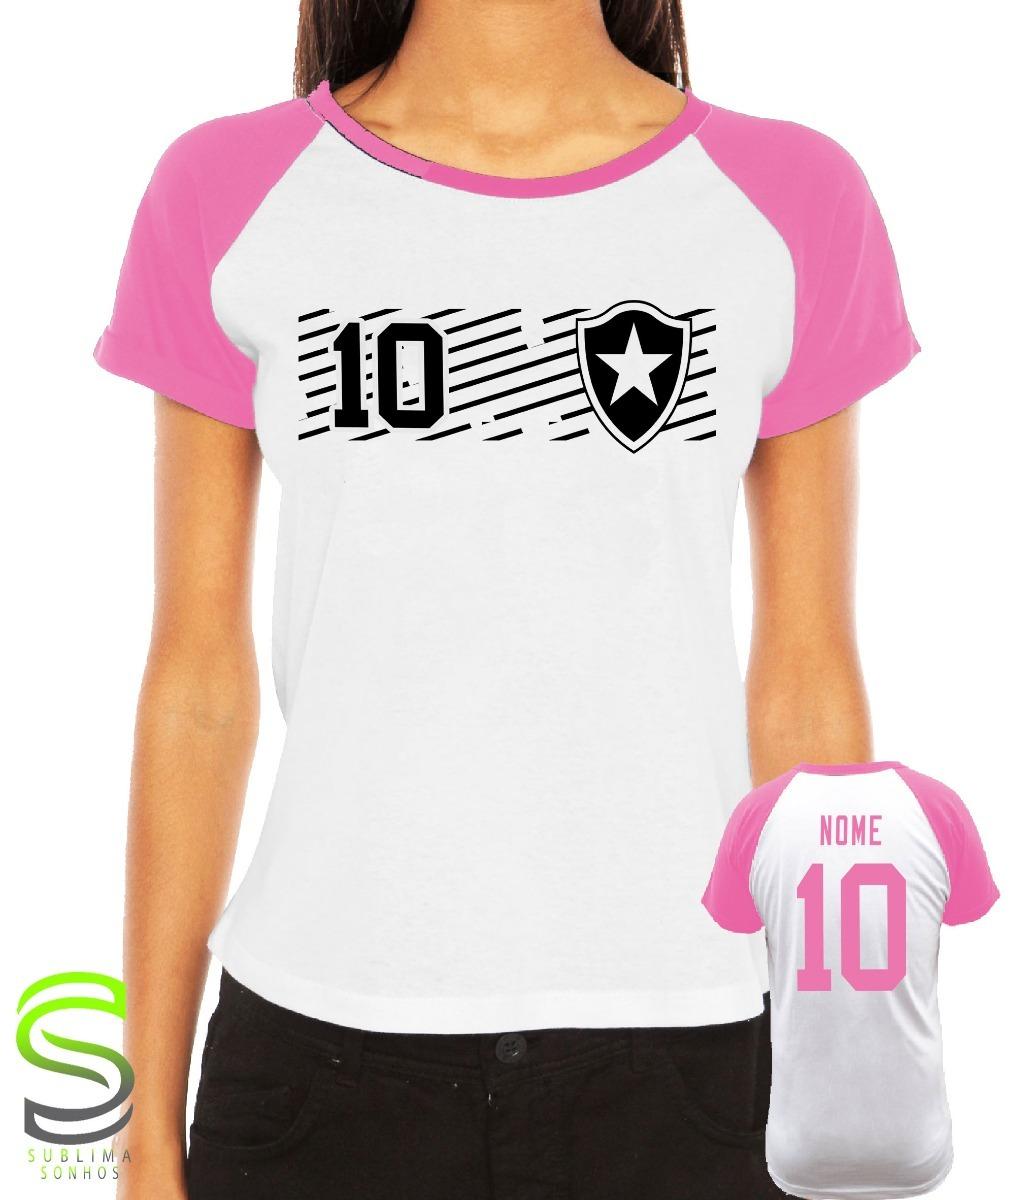 0a12848c17 camiseta botafogo feminina personalizada rosa. Carregando zoom.